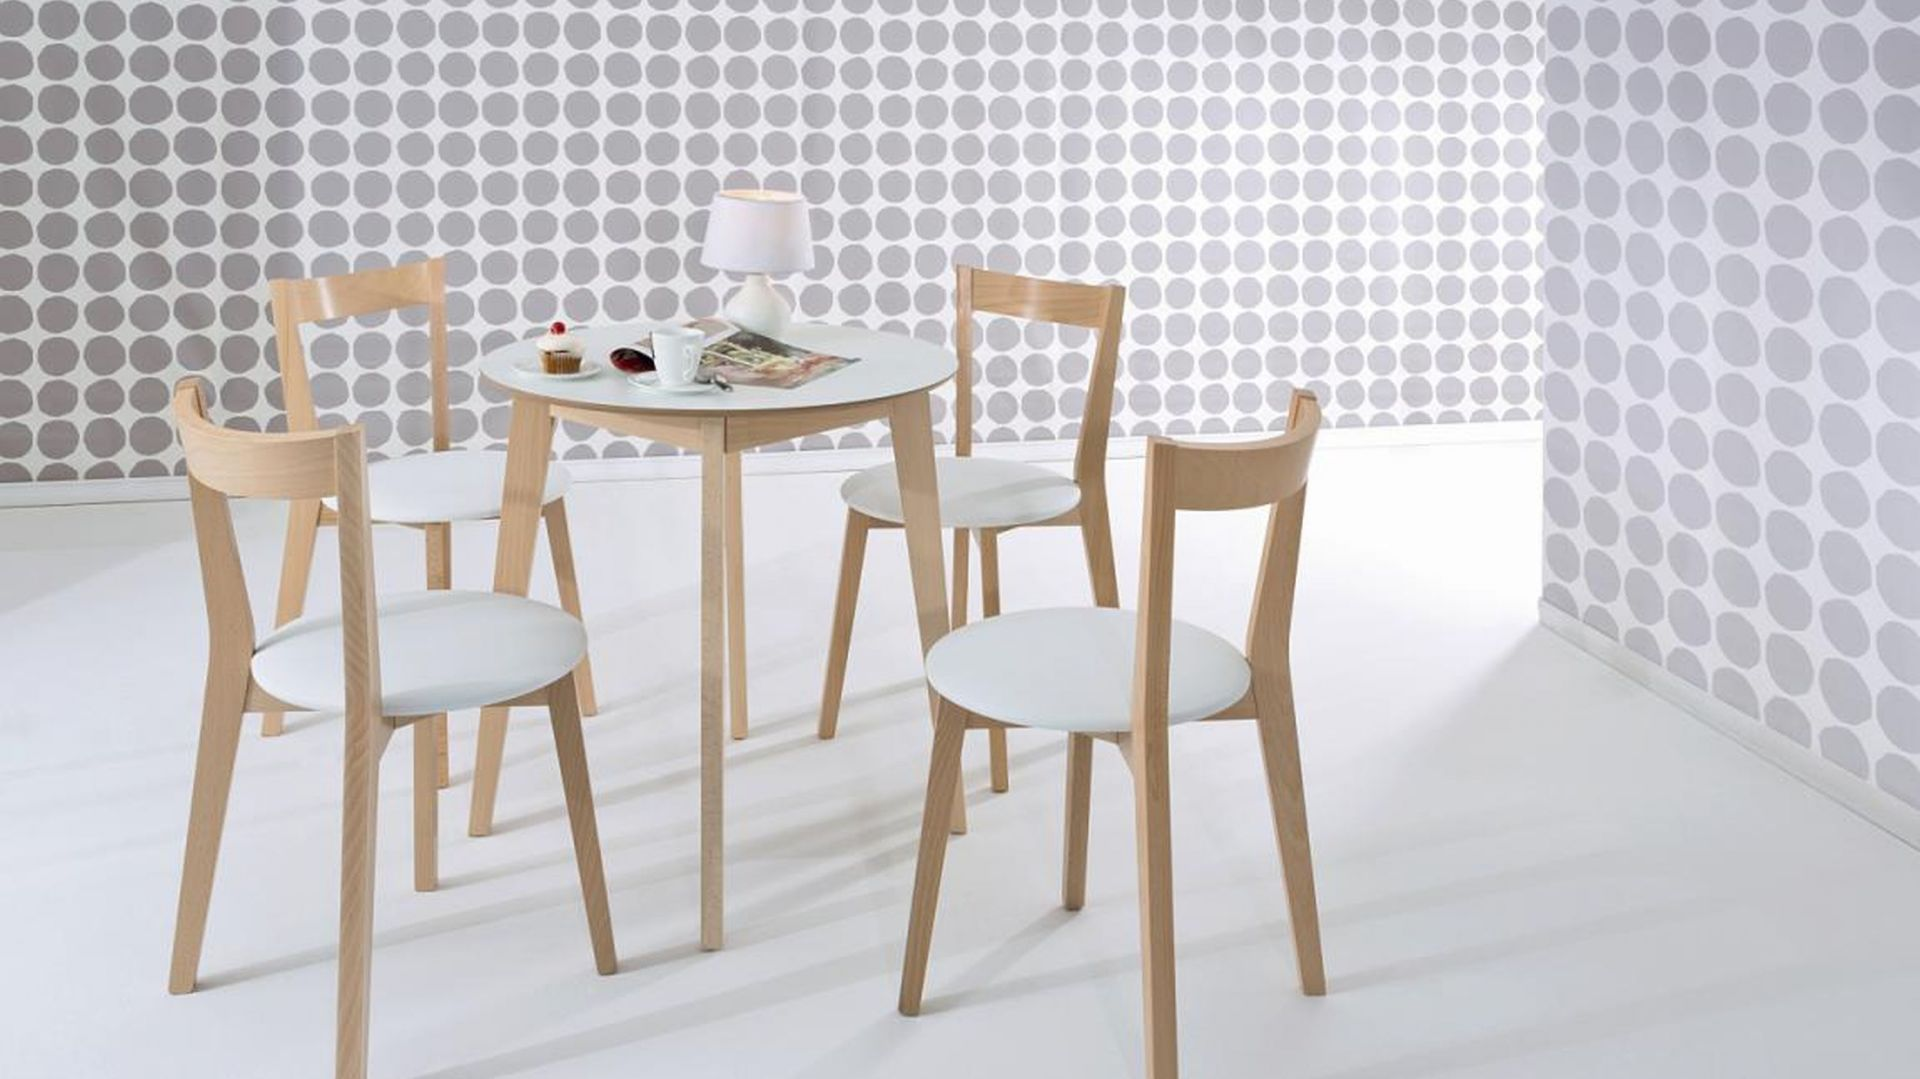 stoły okrągłe i krzesła komplety black red white